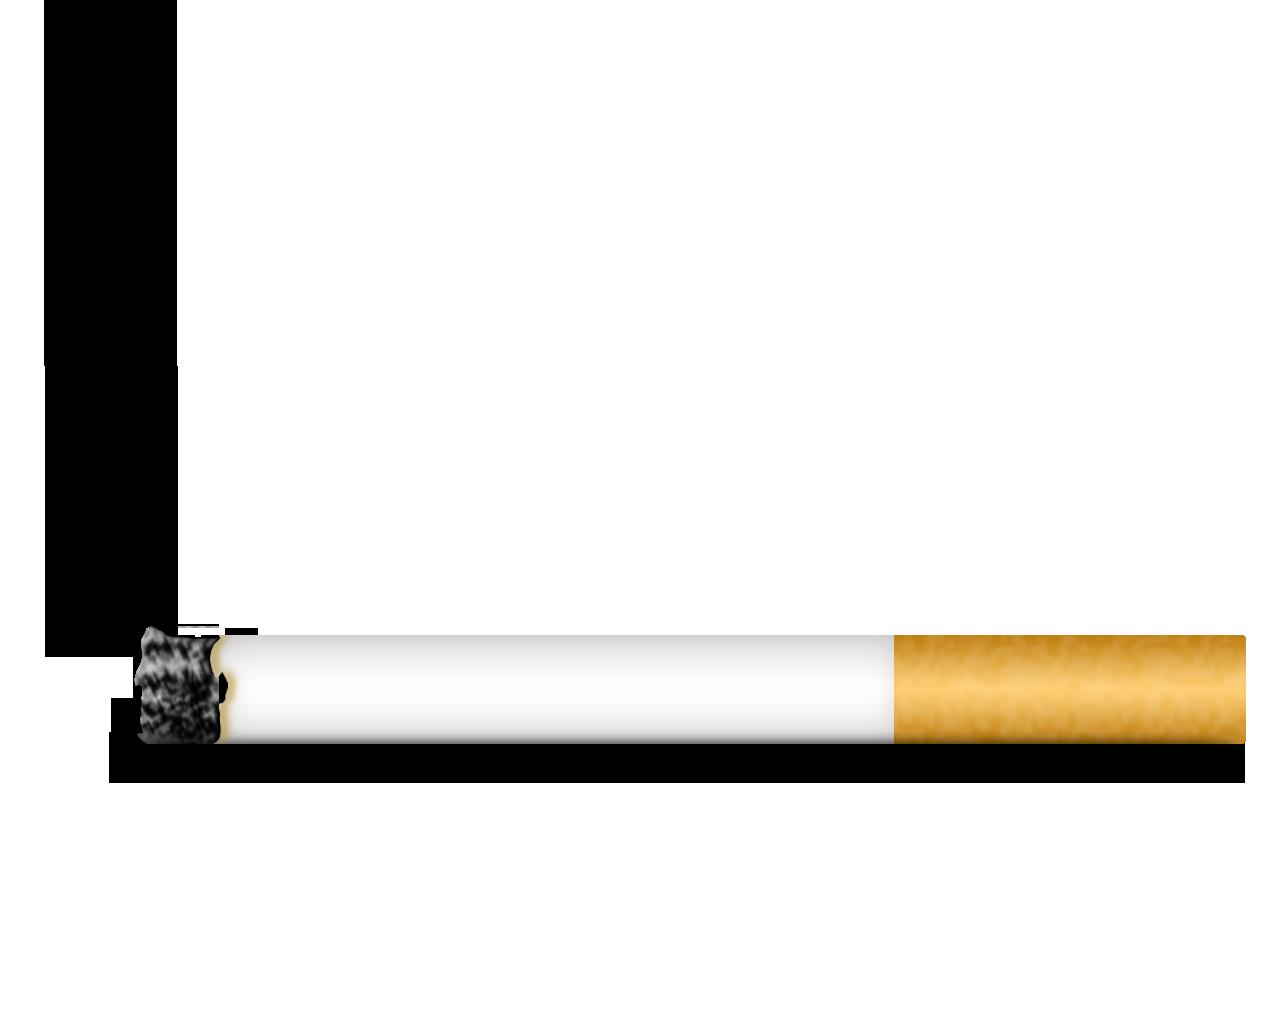 Drawn cigarette transparent background #3